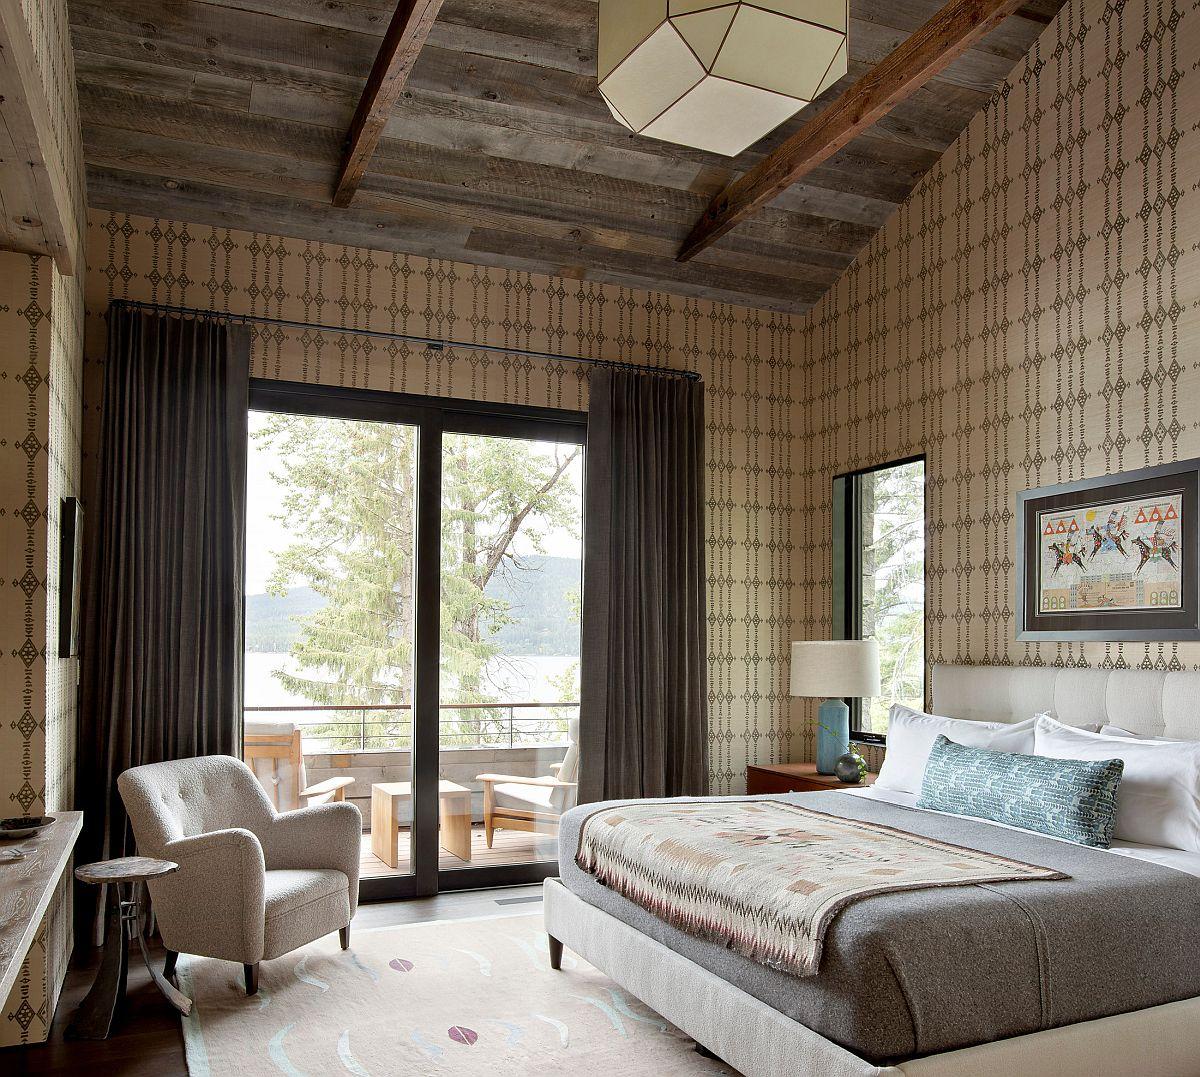 Reclaimed wood and custom wallpaper bring ample pattern to this spaciou rutic bedroom